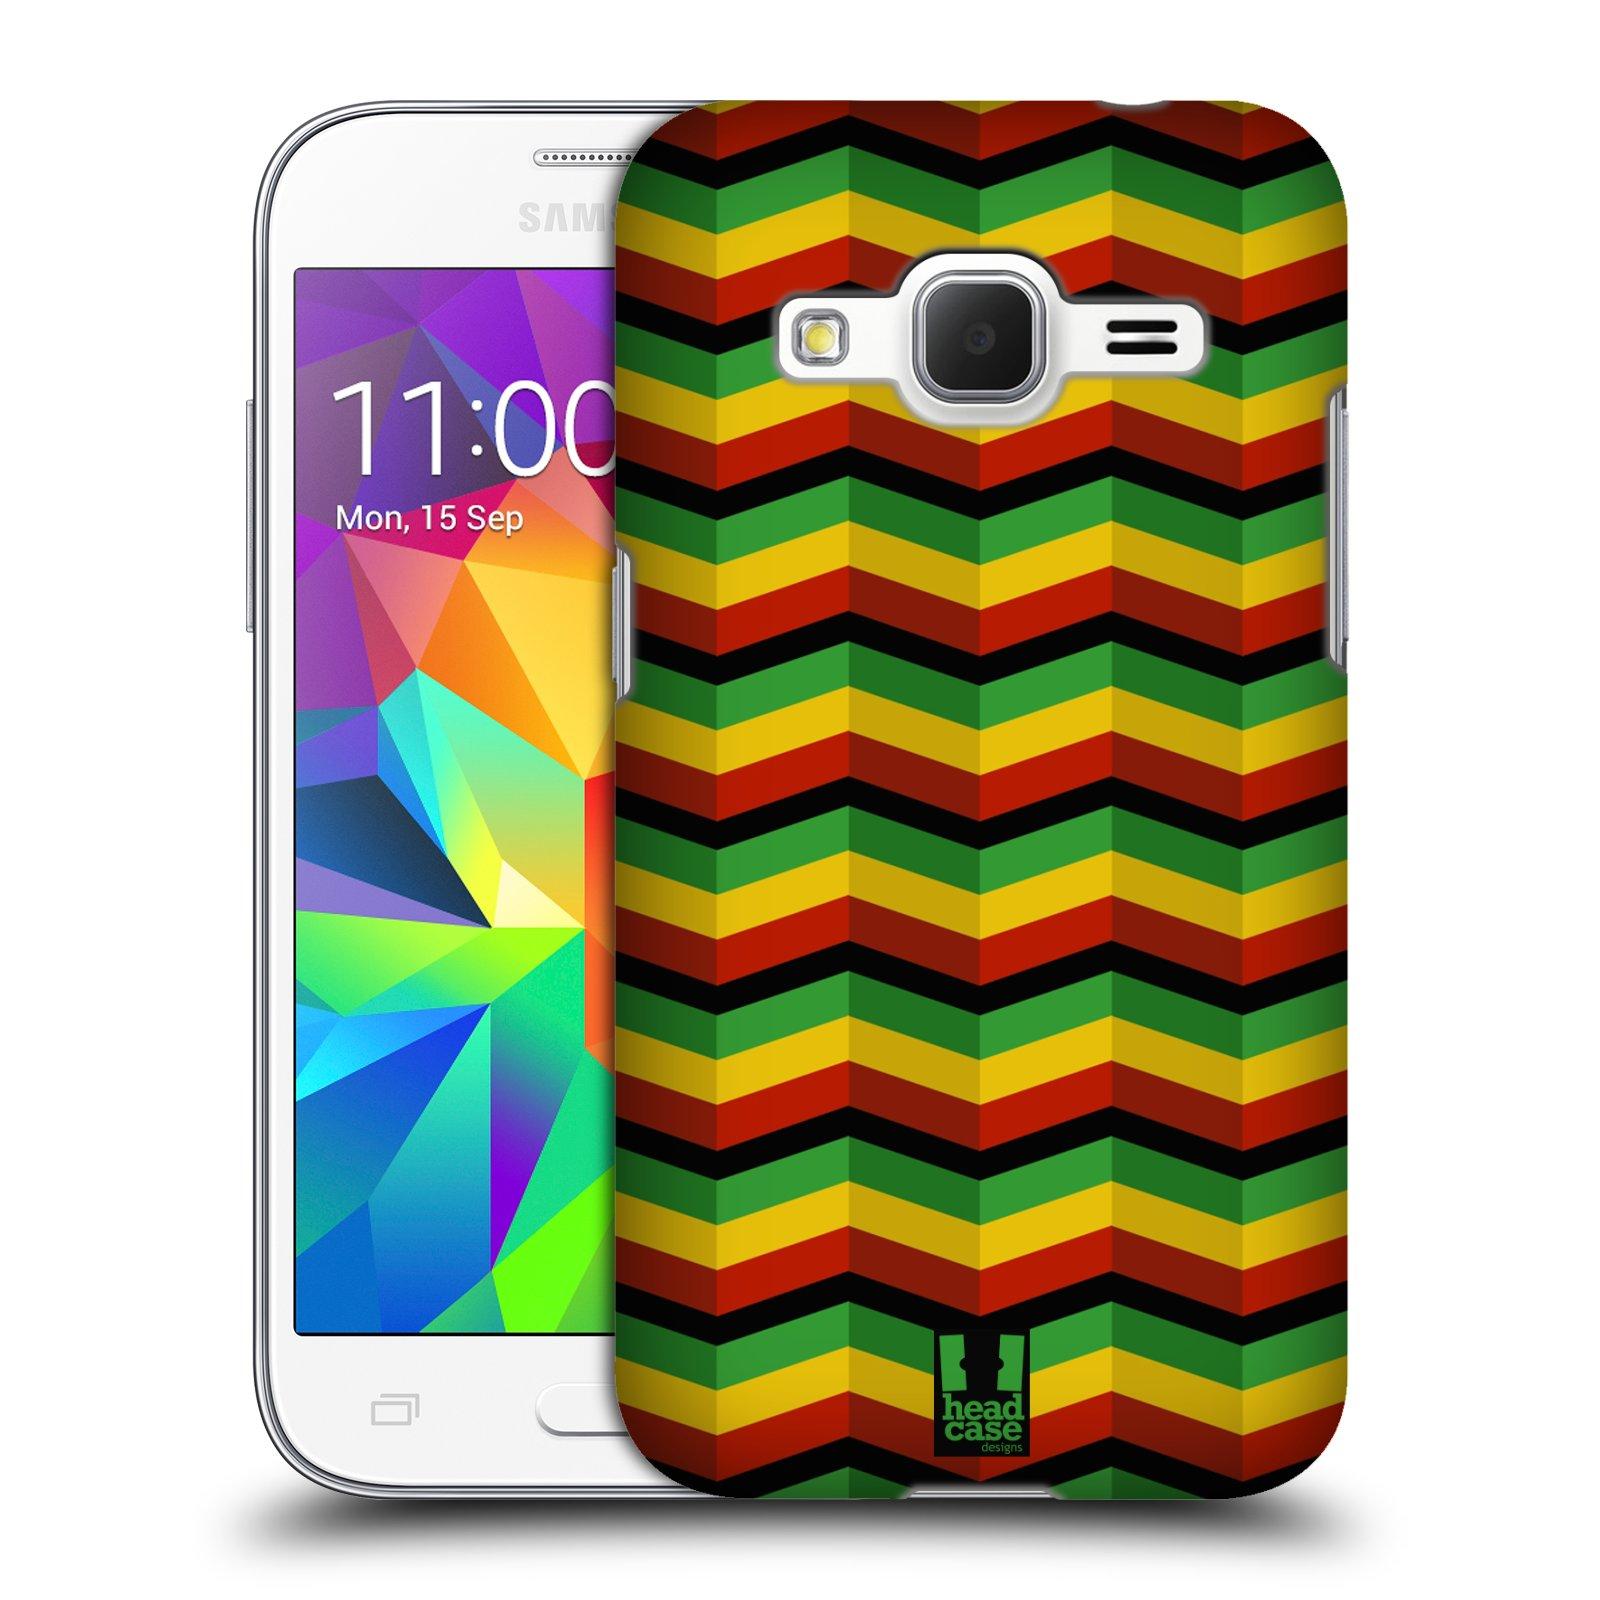 Plastové pouzdro na mobil Samsung Galaxy Core Prime VE HEAD CASE RASTA CHEVRON (Kryt či obal na mobilní telefon Samsung Galaxy Core Prime LTE VE SM-G361F)